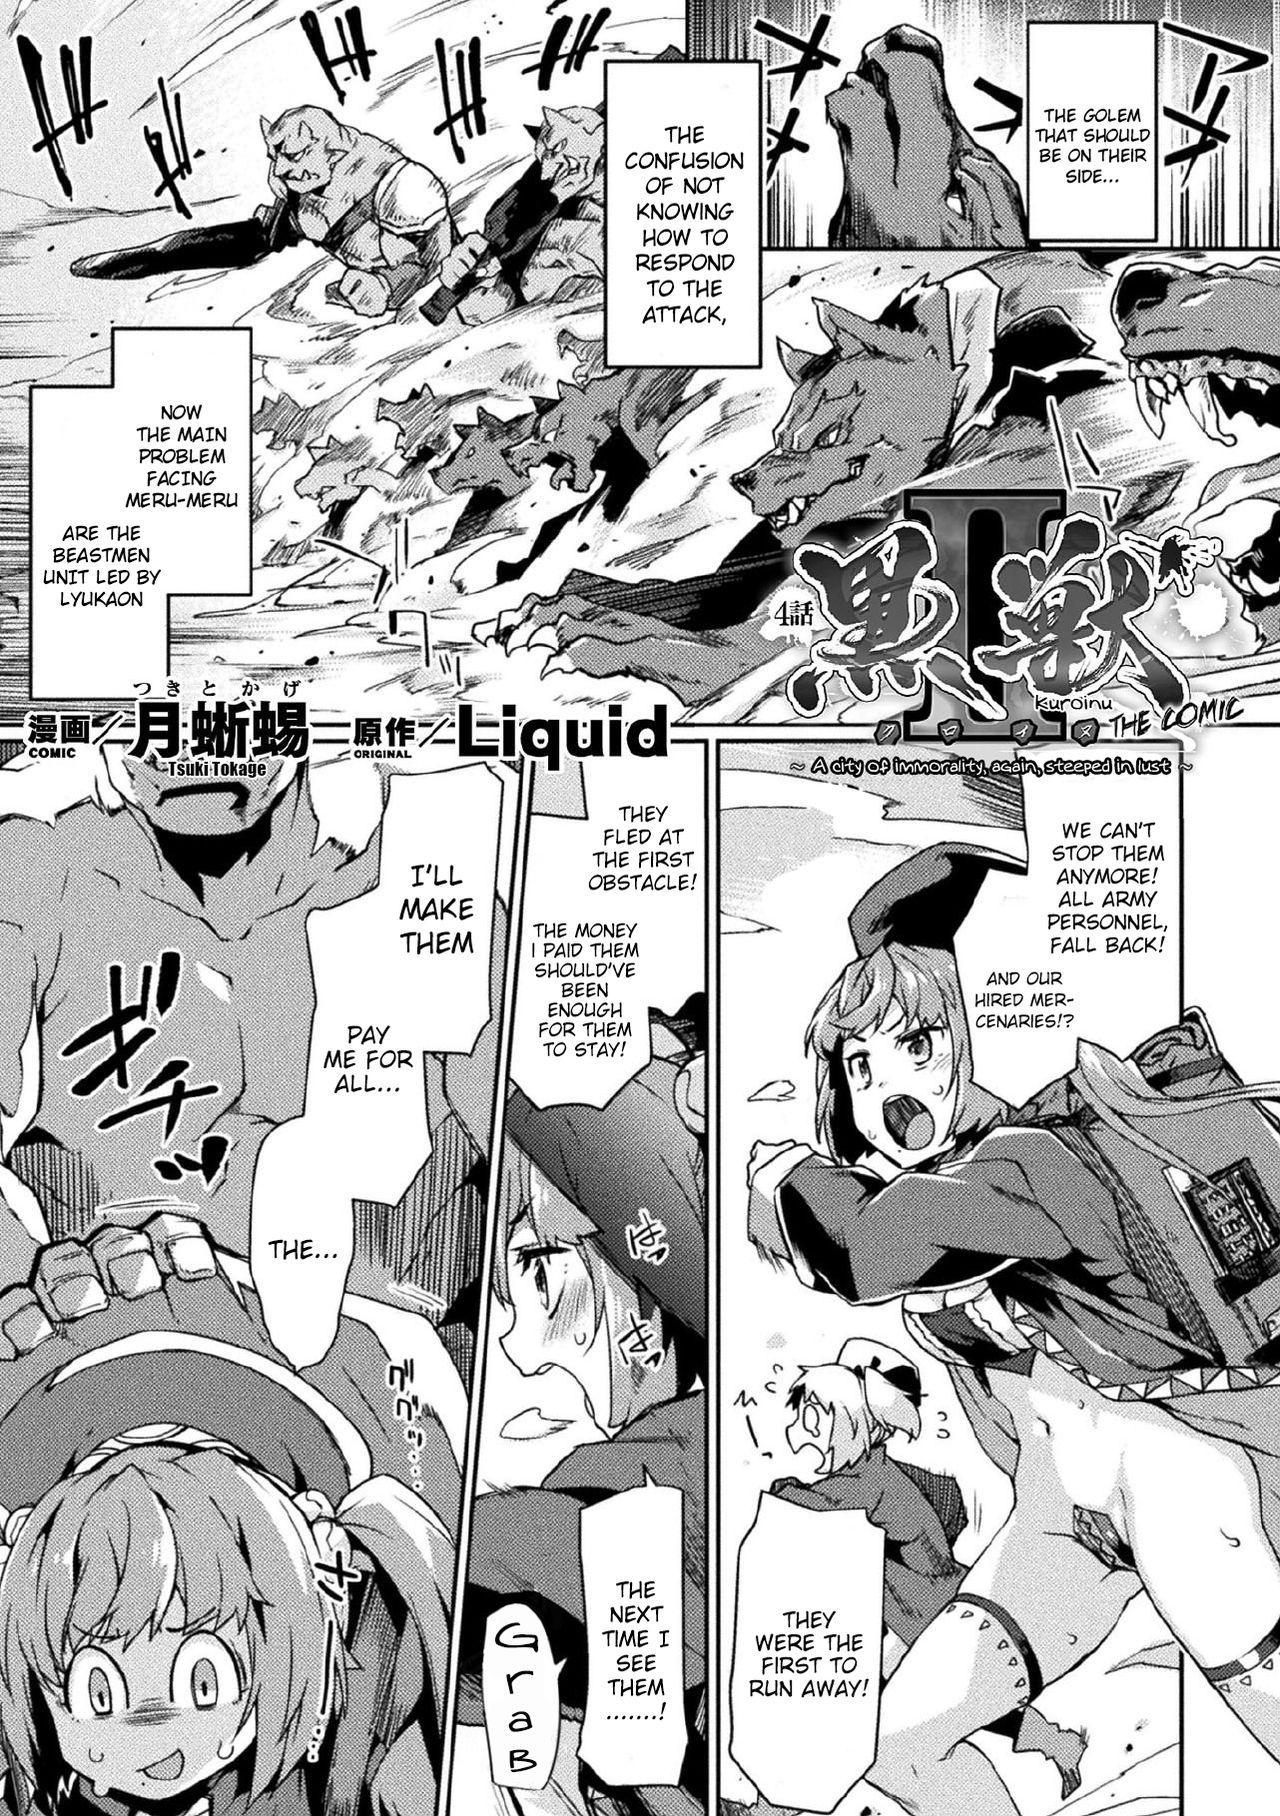 [Tsukitokage] Kuroinu II ~Inyoku ni Somaru Haitoku no Miyako, Futatabi~ THE COMIC Ch. 4 (Kukkoro Heroines Vol. 3) [English] [Klub Kemoner, Raknnkarscans] [Decensored] [Digital] 0